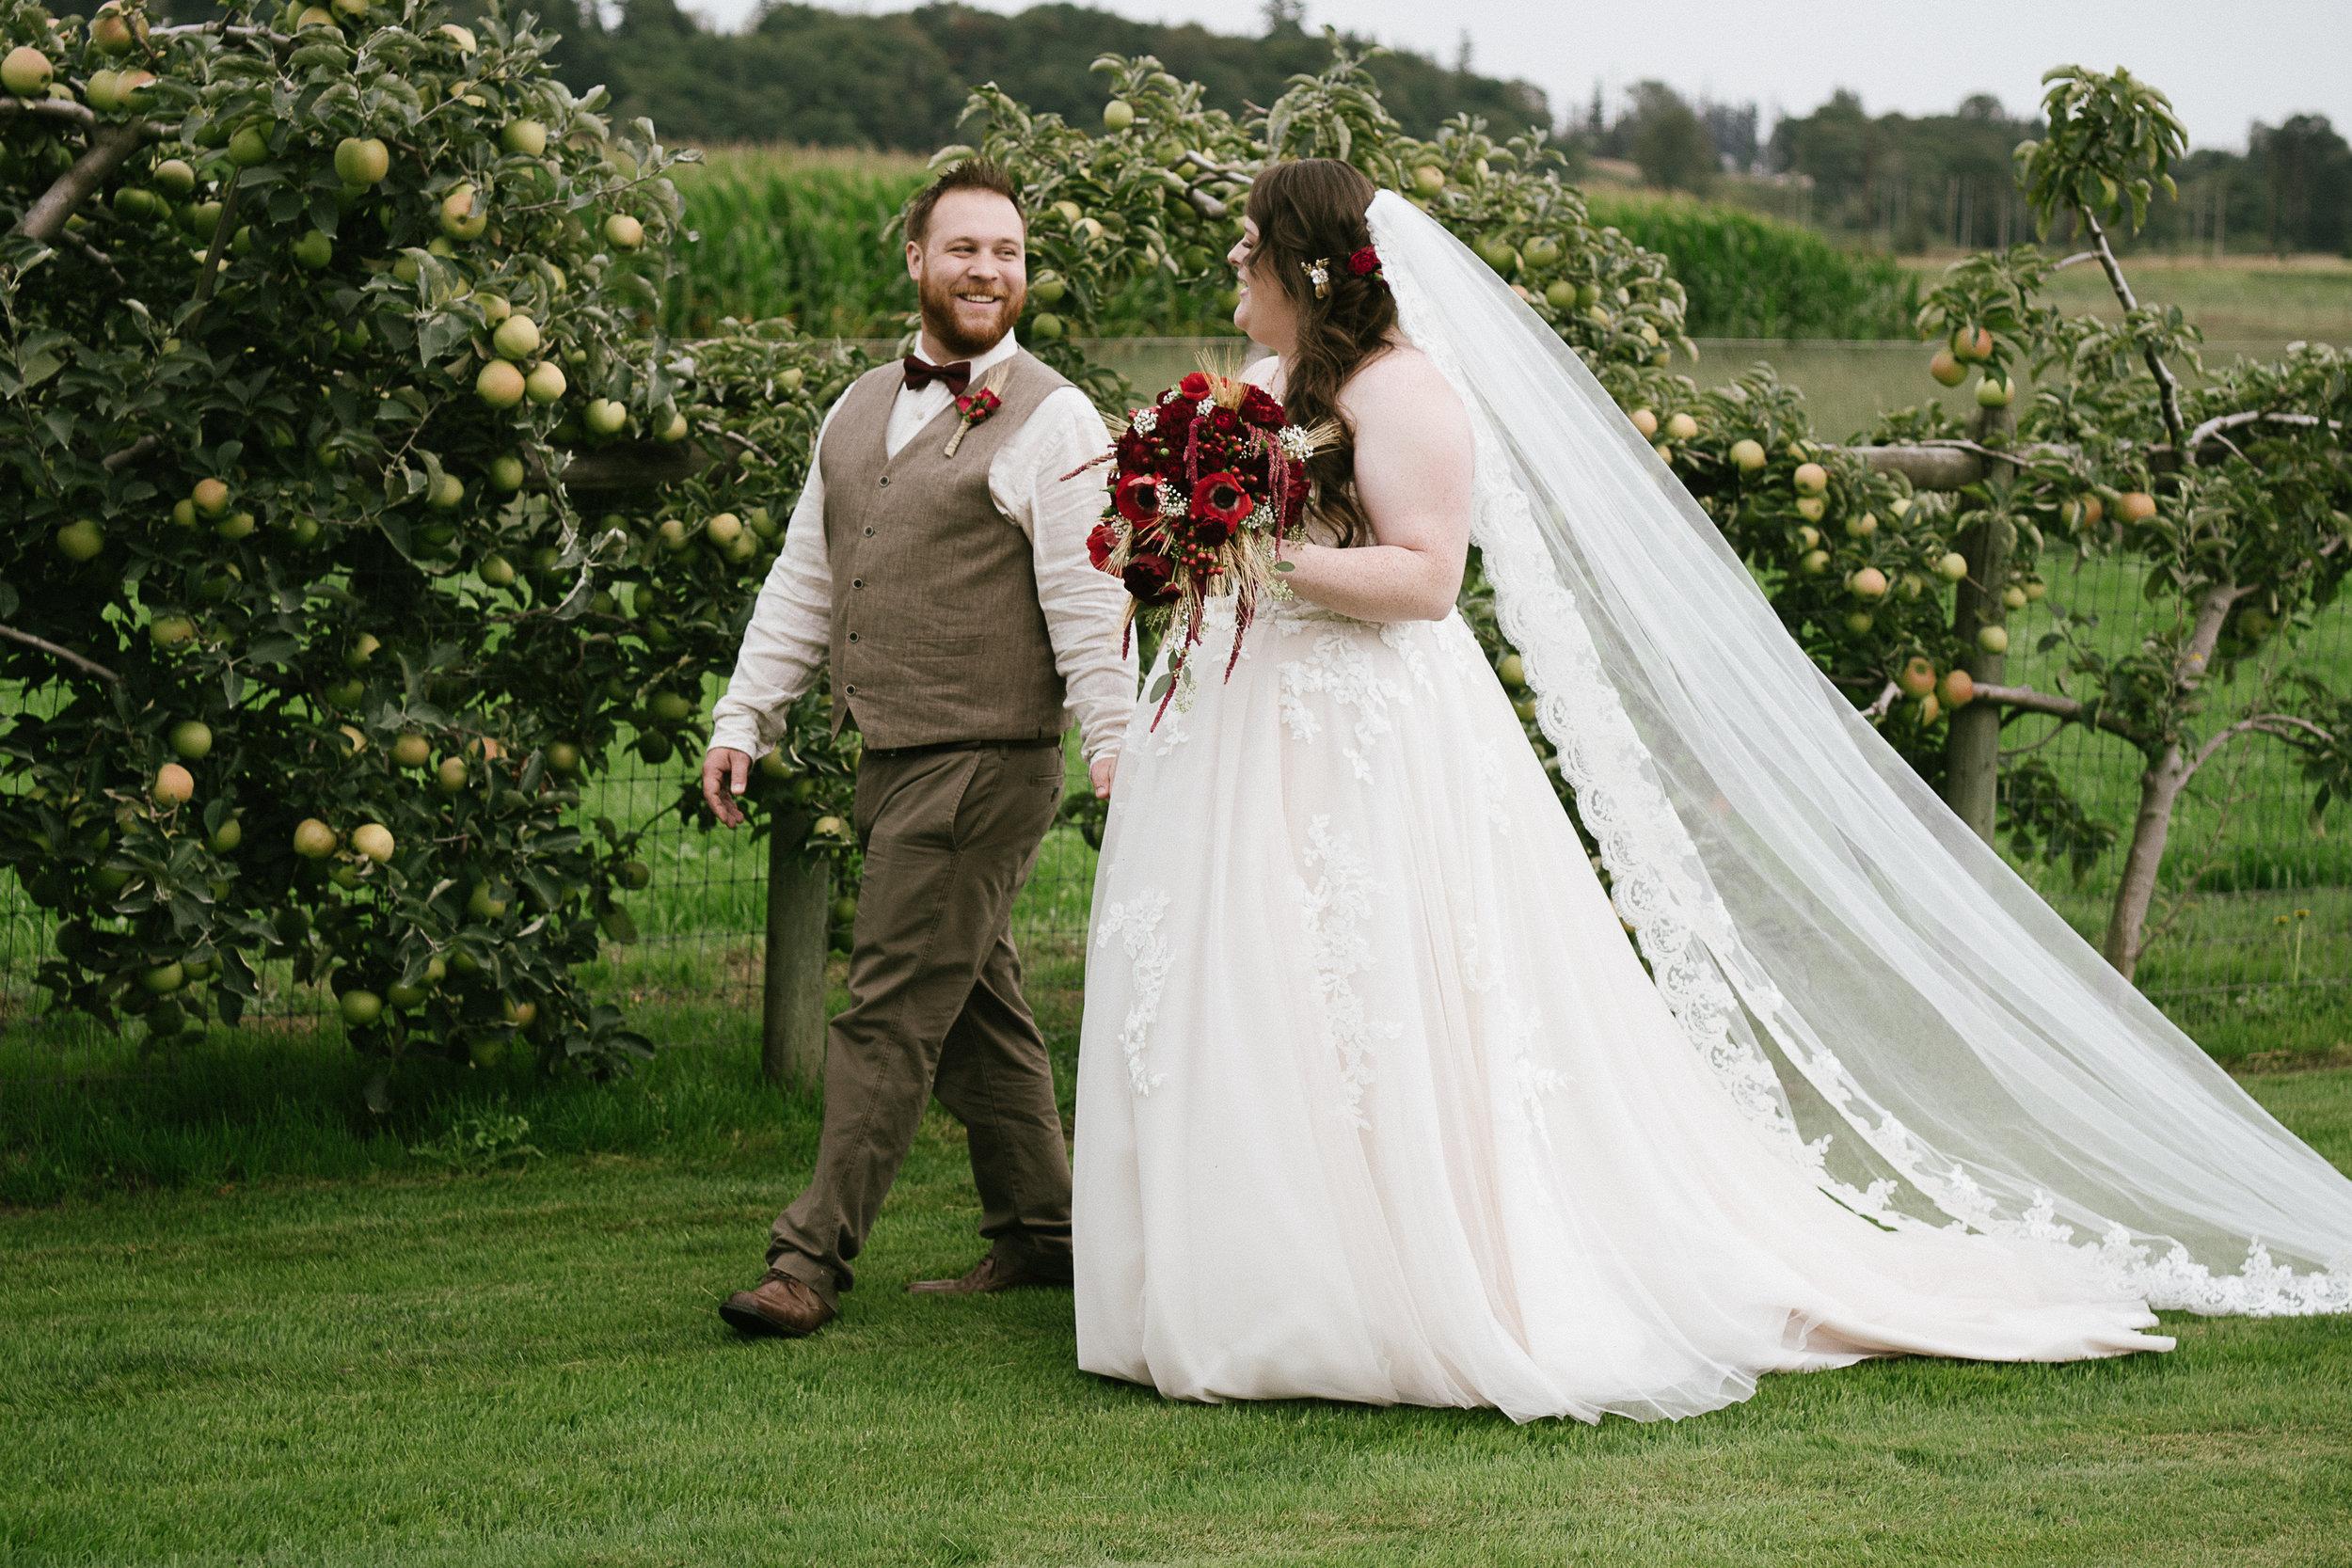 Swan Trail Farm Wedding_Sarah Schurman + Brian Skadan_Snohomish Wedding_Kelsey Lane Photography-6271-2.jpg